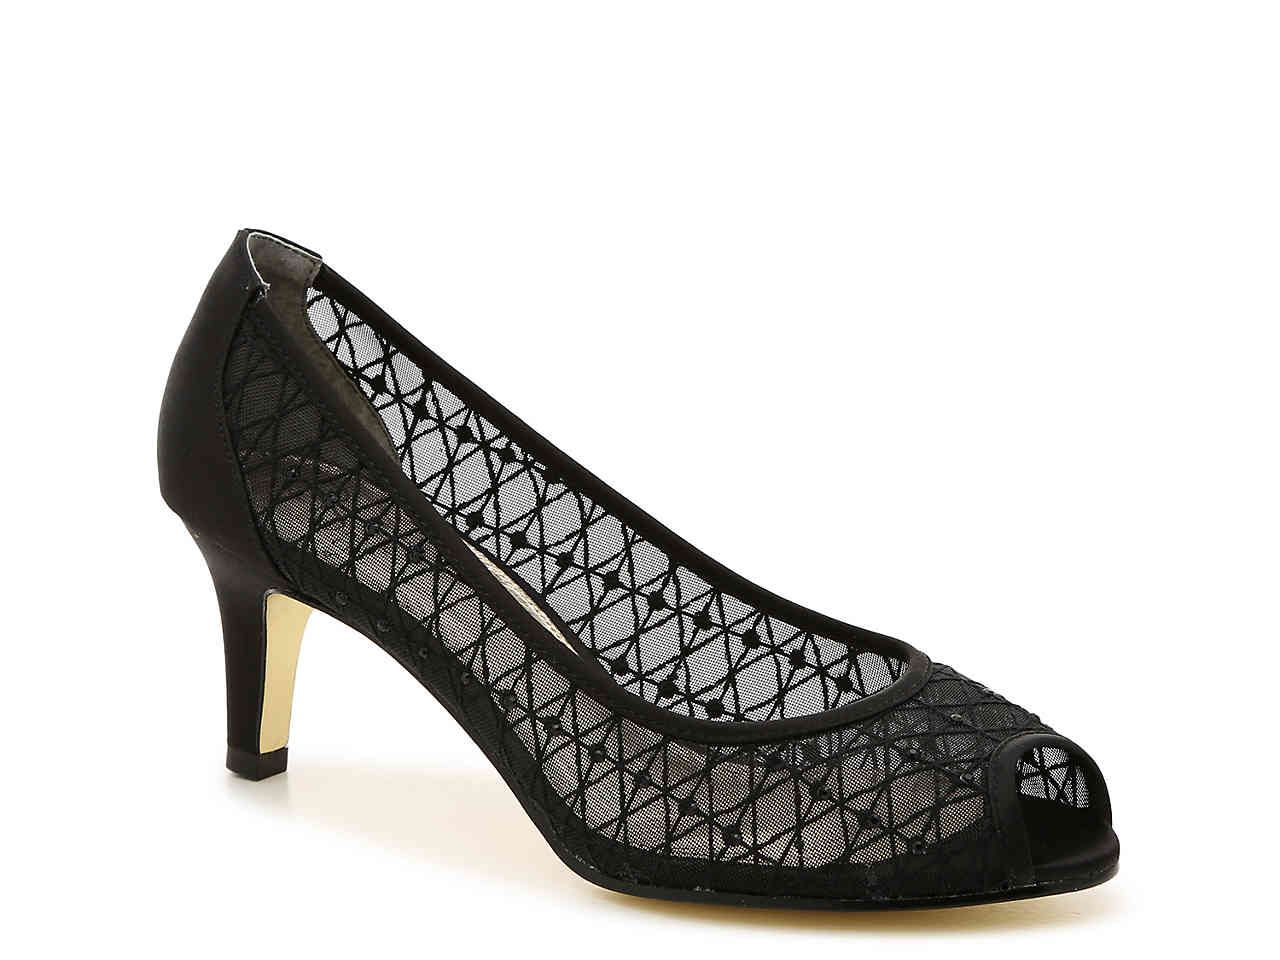 Adrianna Papell Juliette Pump Women S Shoes Dsw Womens Low Heels Pumps Heels Shopping